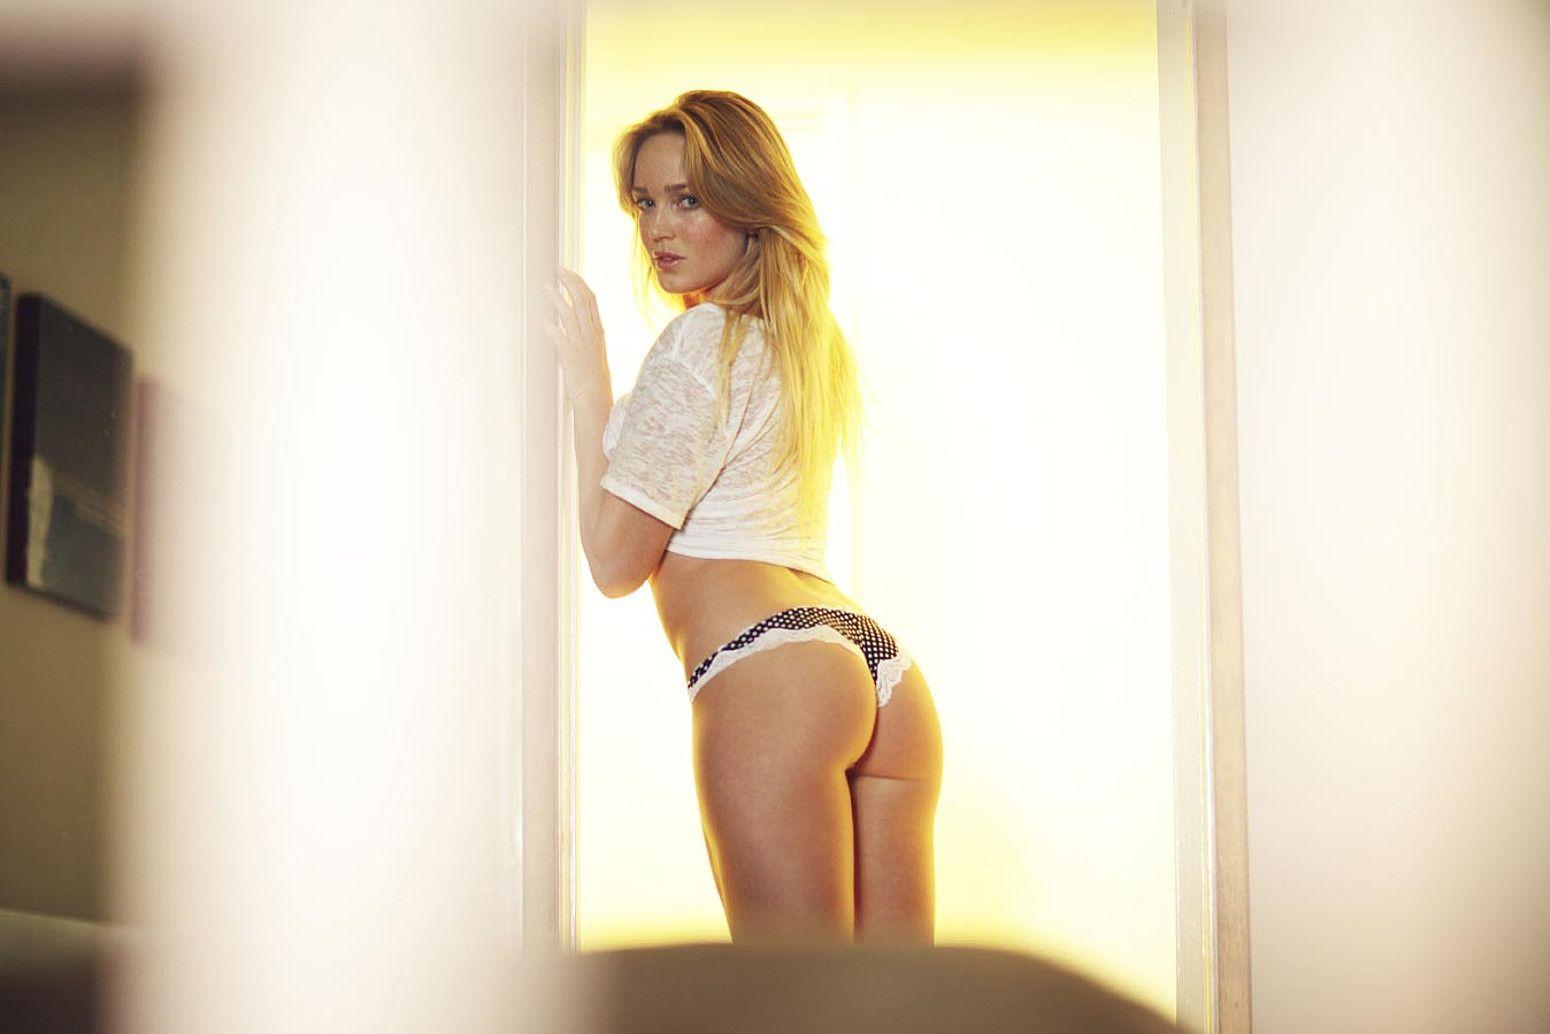 Communication on this topic: Victoria sinitsina sexy, caity-lotz-sexy-2-new-photos/